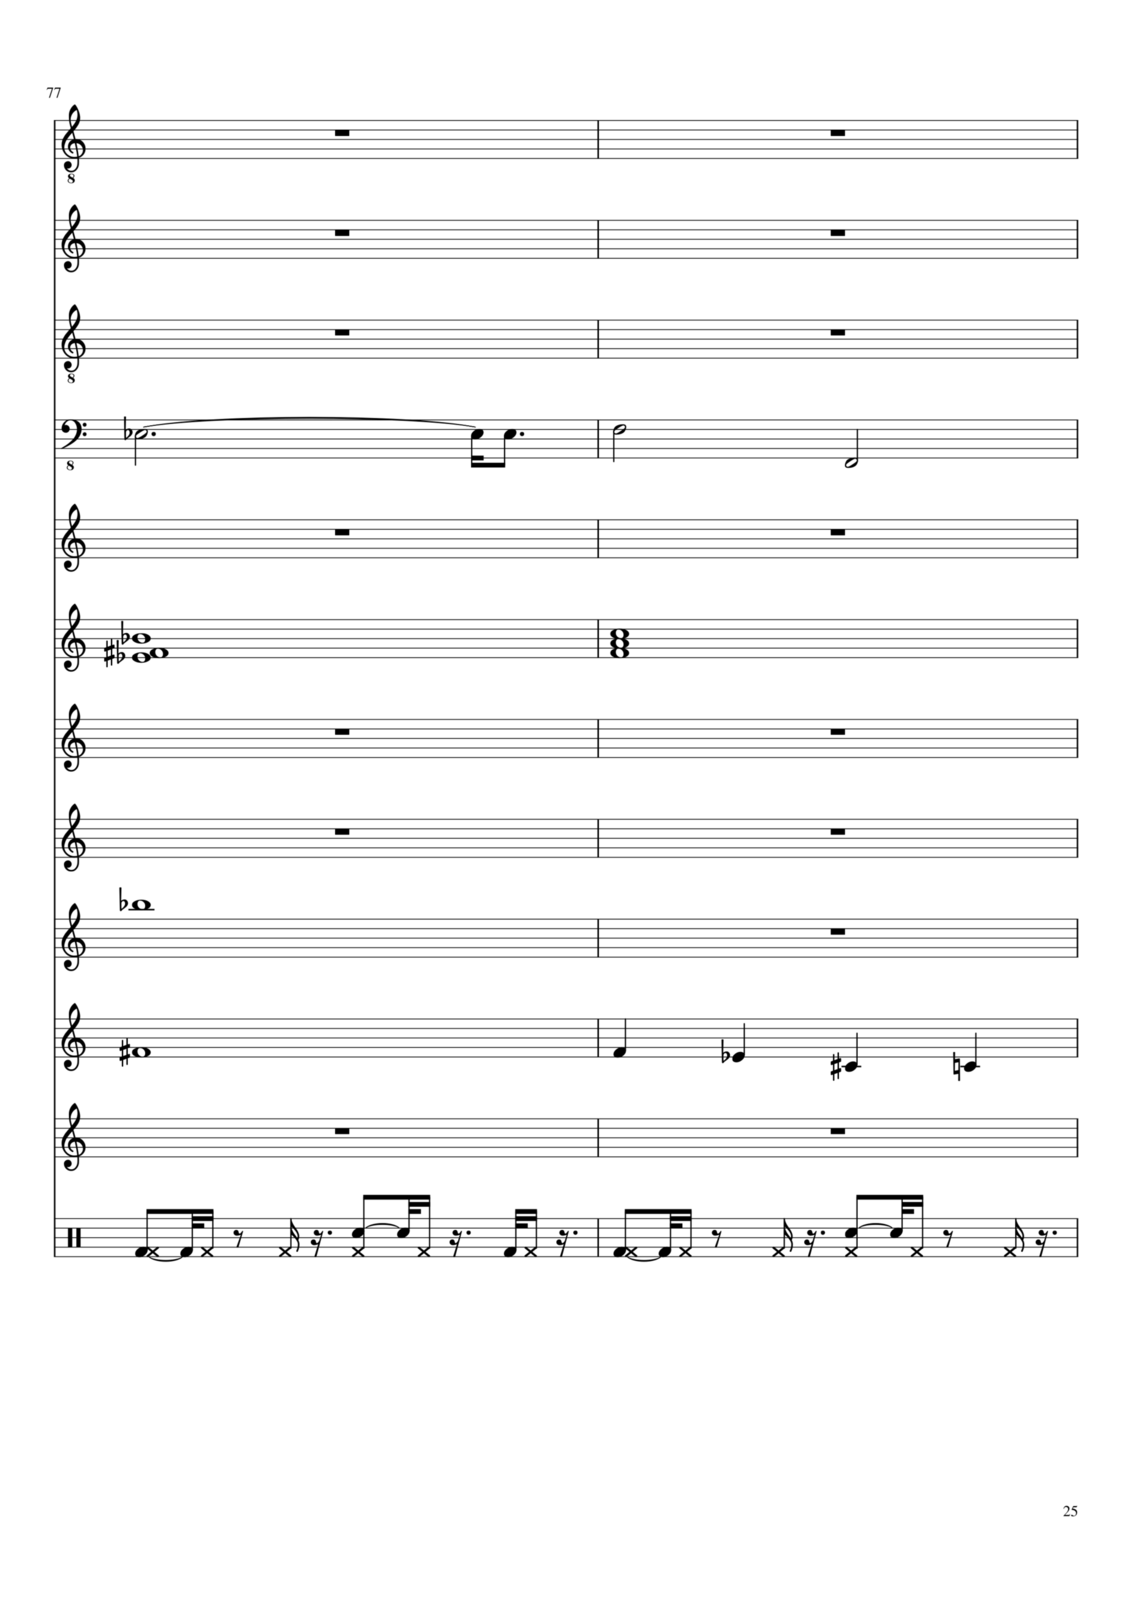 Prosti slide, Image 25